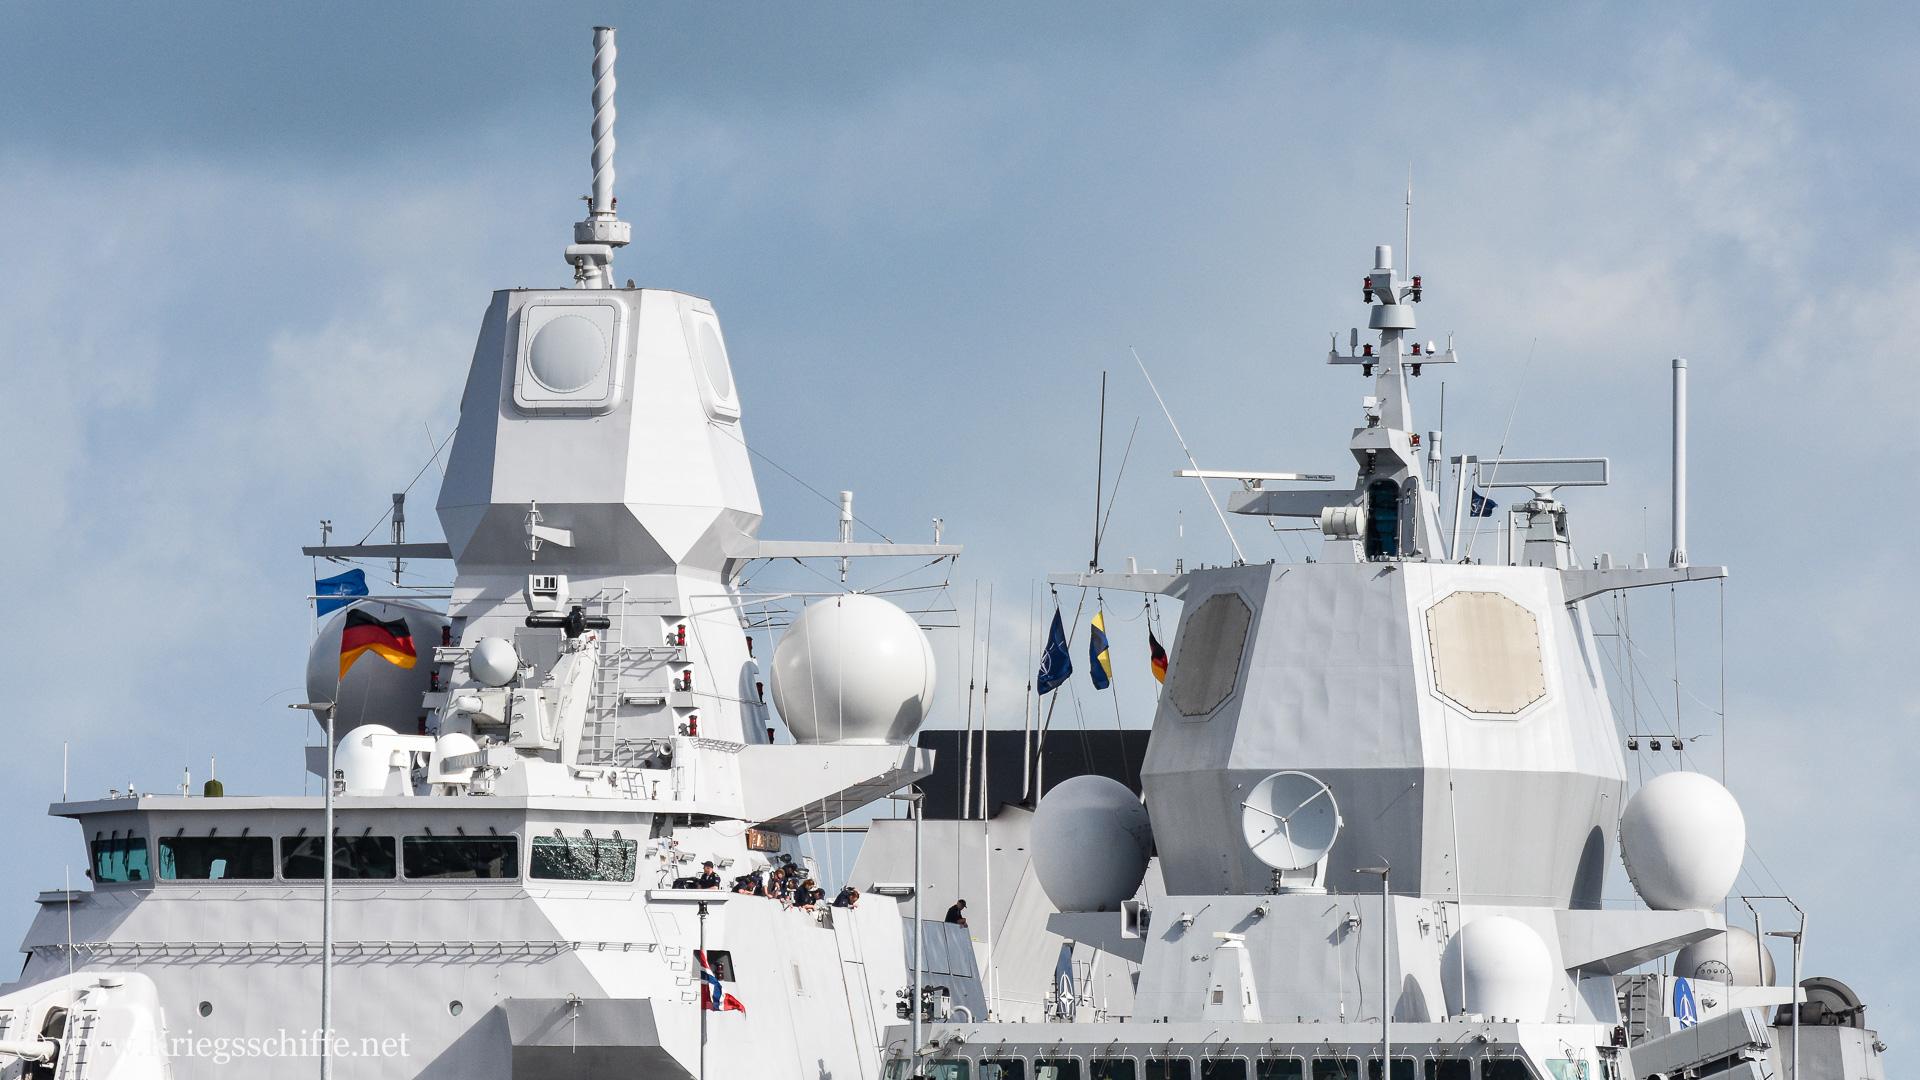 links 'APAR', rechts das amerikanische 'SPY-1F' Radar